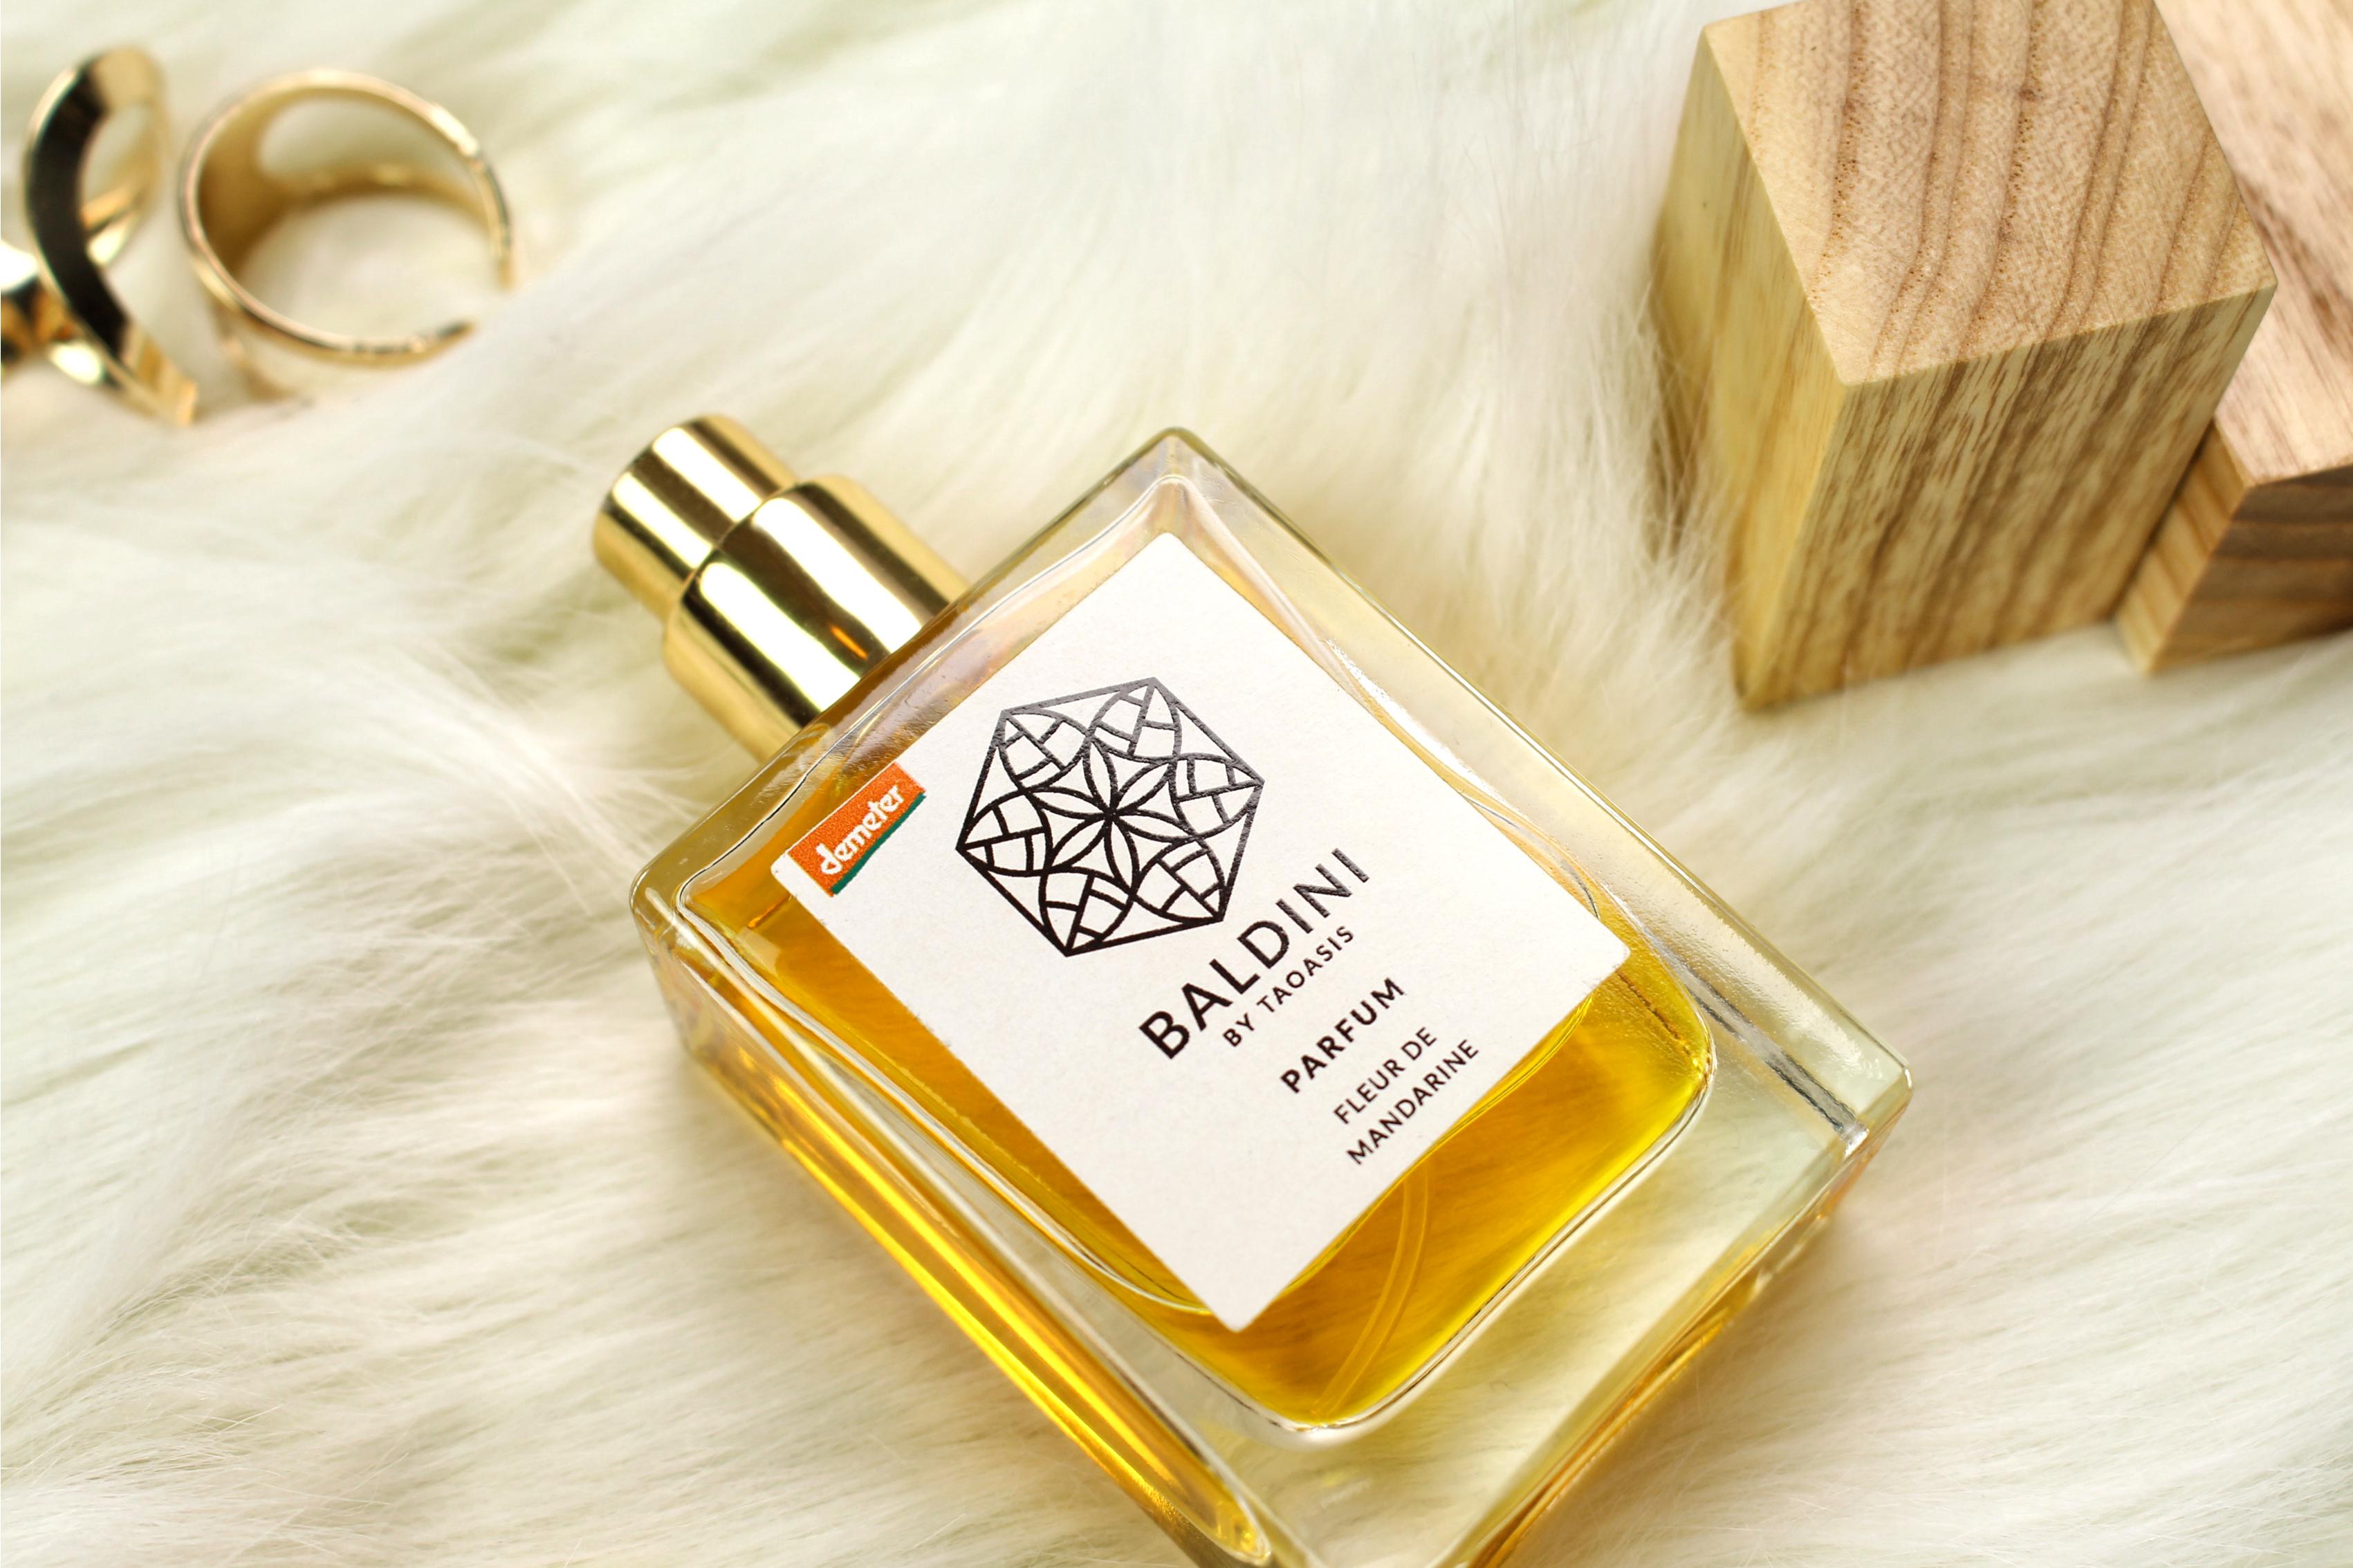 baldini-naturparfum-bois-de-petit-grain-taoasis-demeter